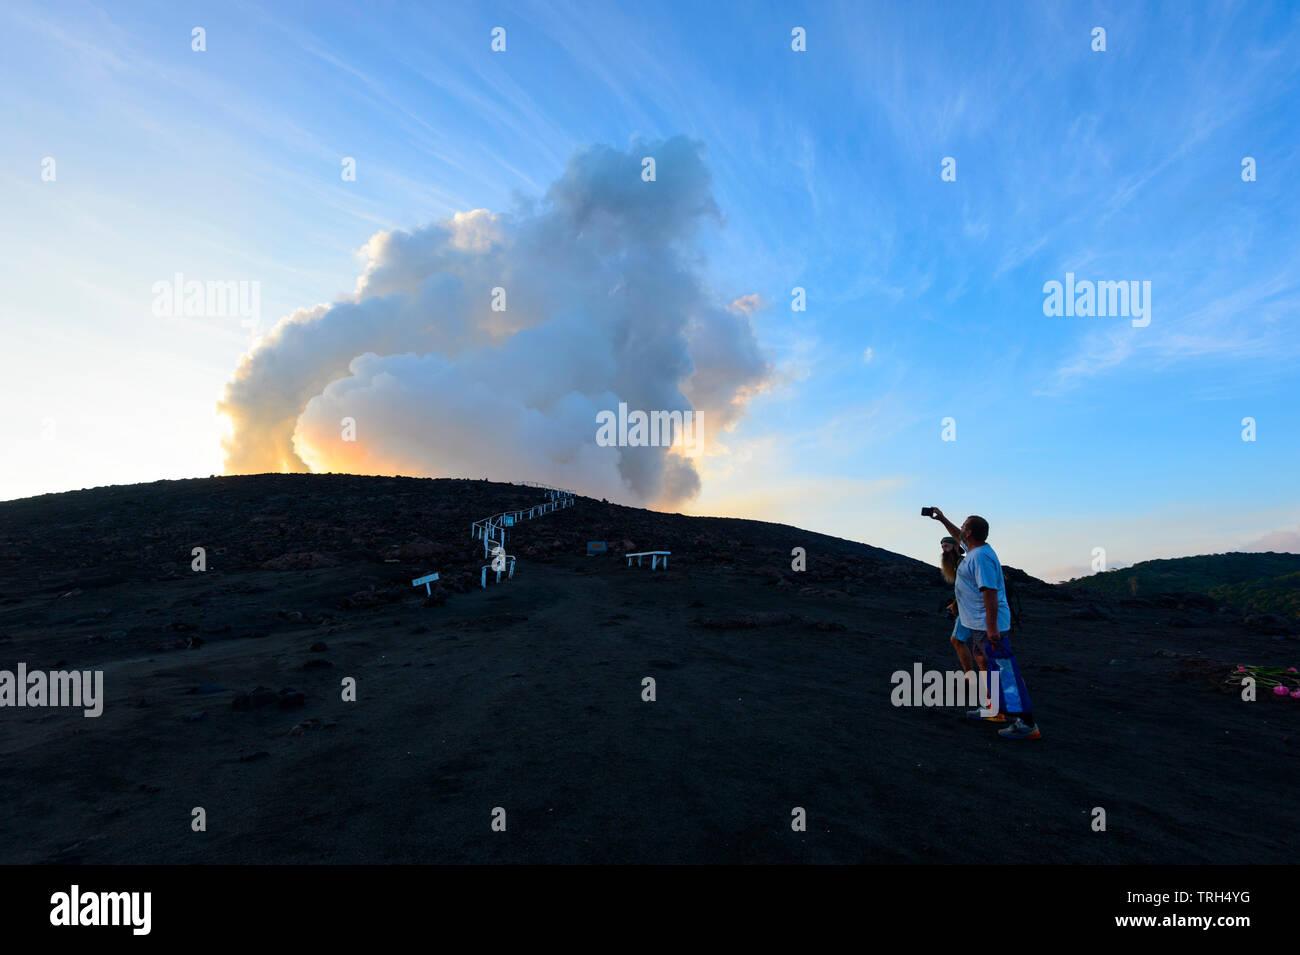 Tourists standing on the slopes of erupting Mt Yasur Volcano at sunset, Tanna Island, Vanuatu - Stock Image